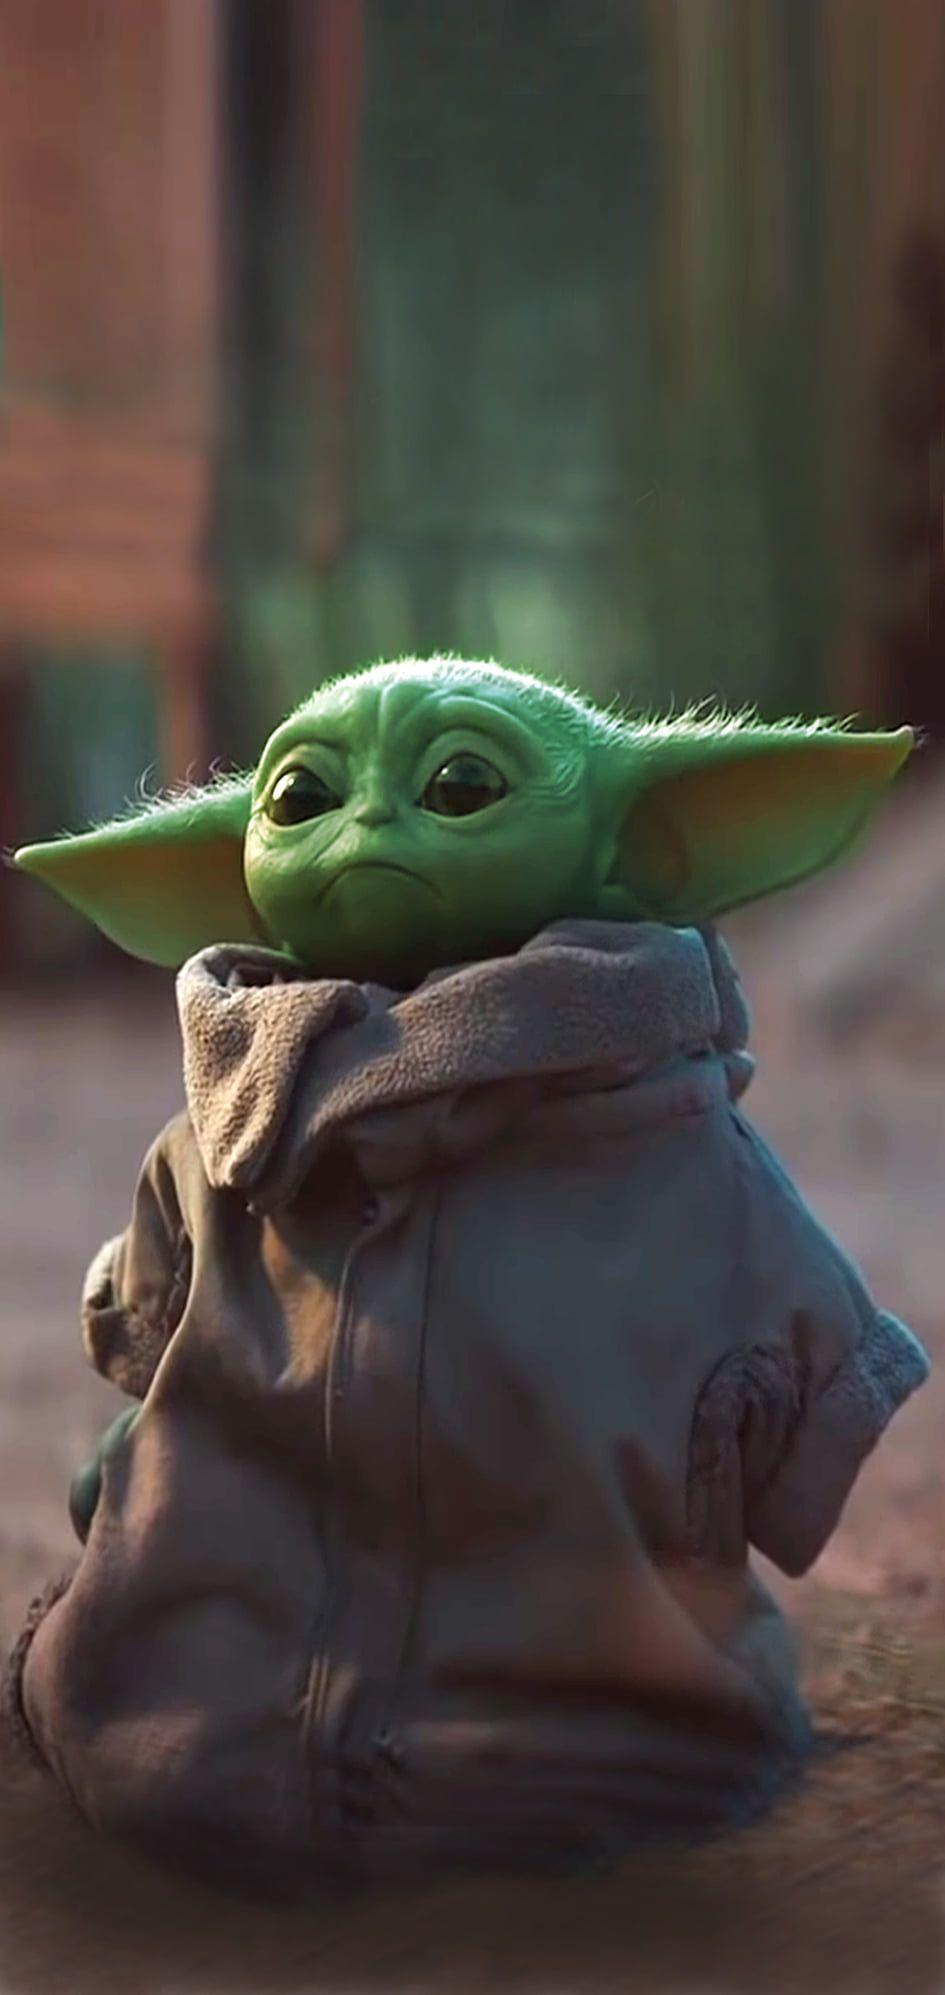 Baby Yoda Mobile Wallpaper In 2020 Yoda Wallpaper Mobile Wallpaper Yoda Gif